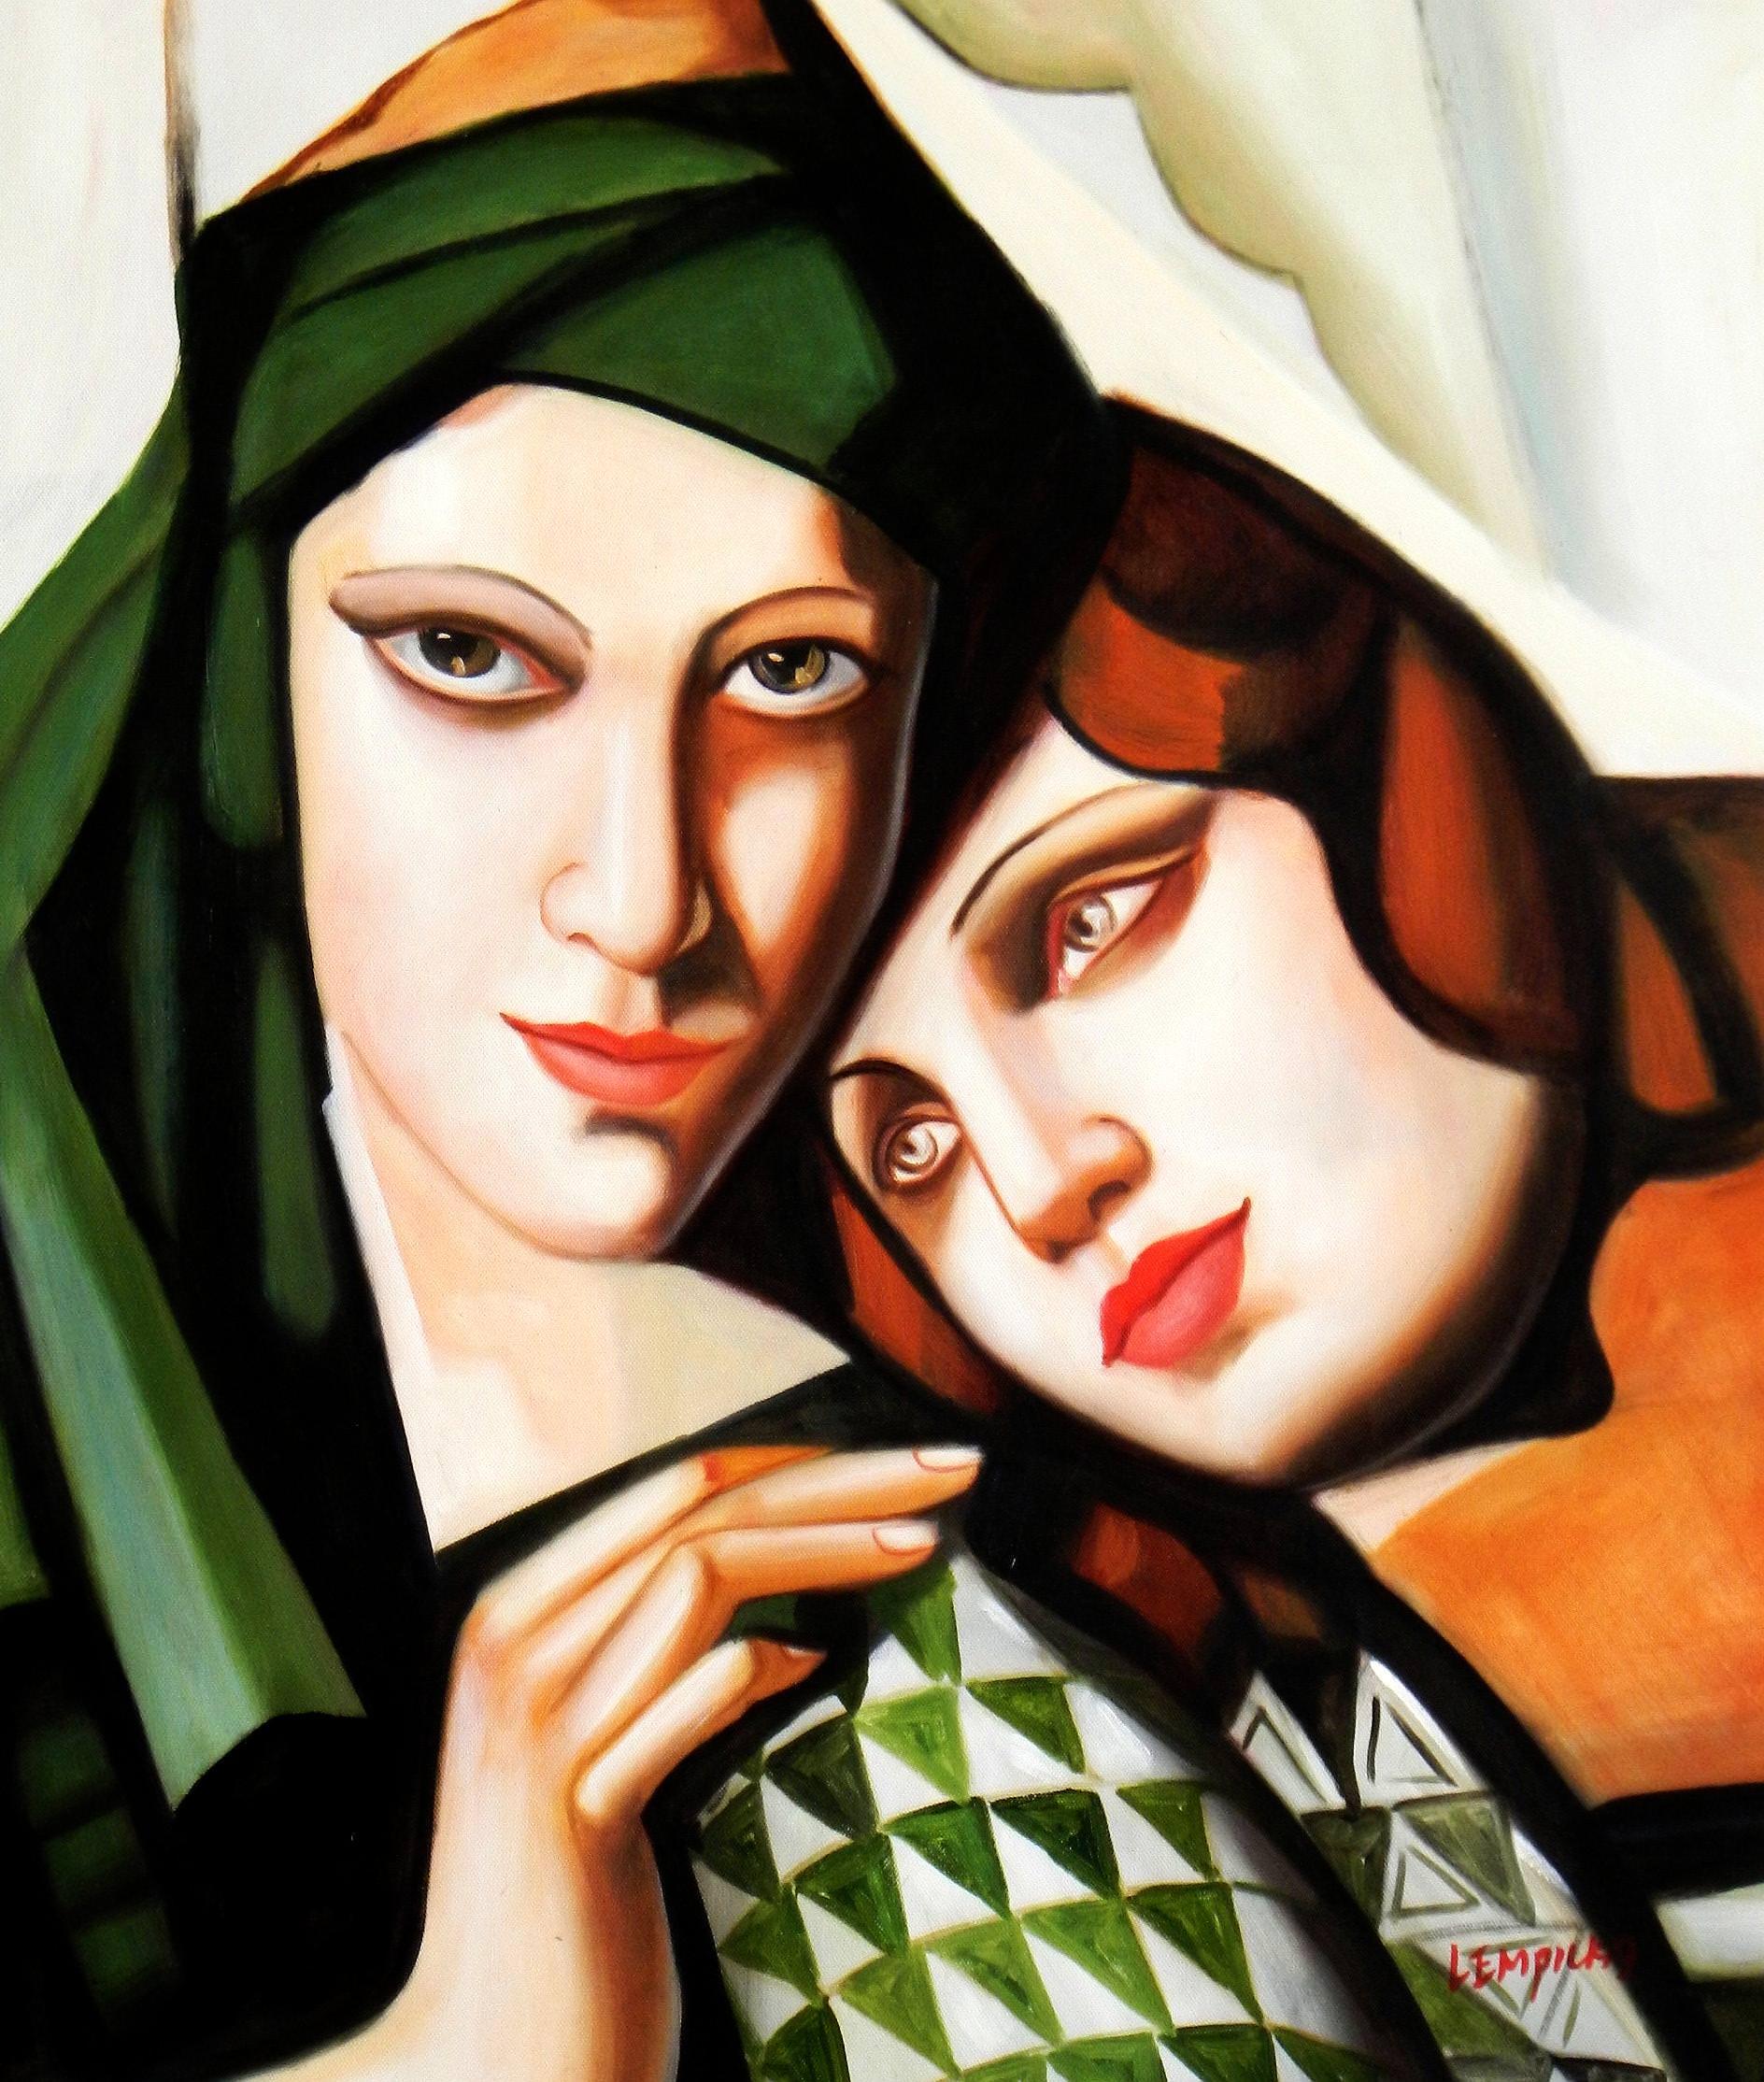 Homage of Tamara de Lempicka - Der grüne Turban c93269 50x60cm exquisites Ölbild